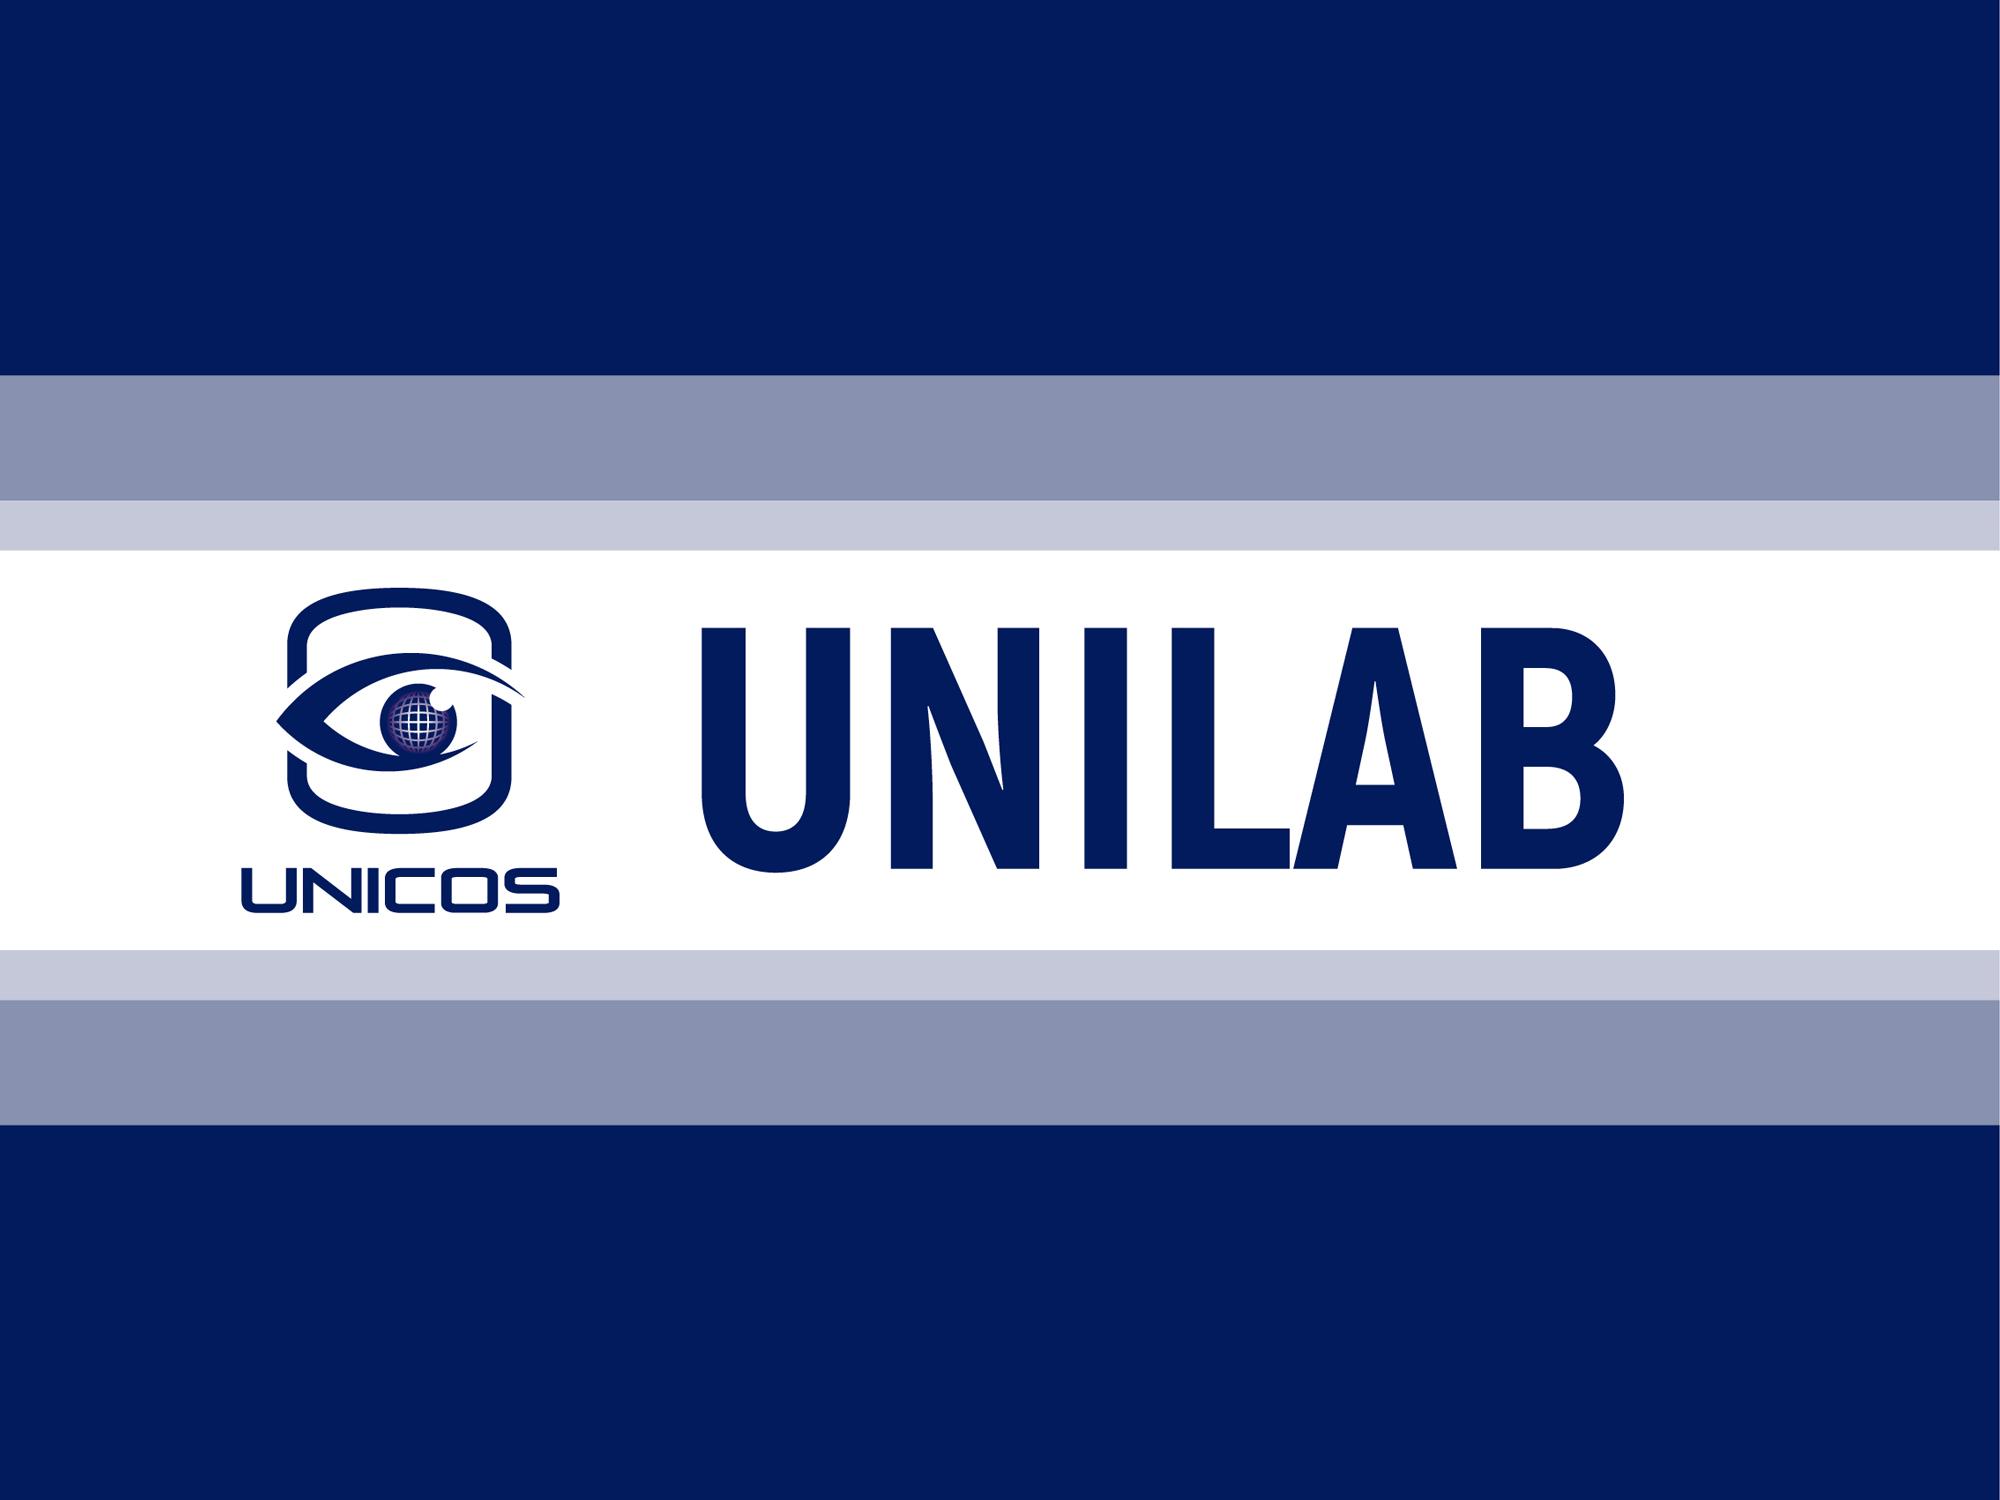 Unilab for LAB/SHOP